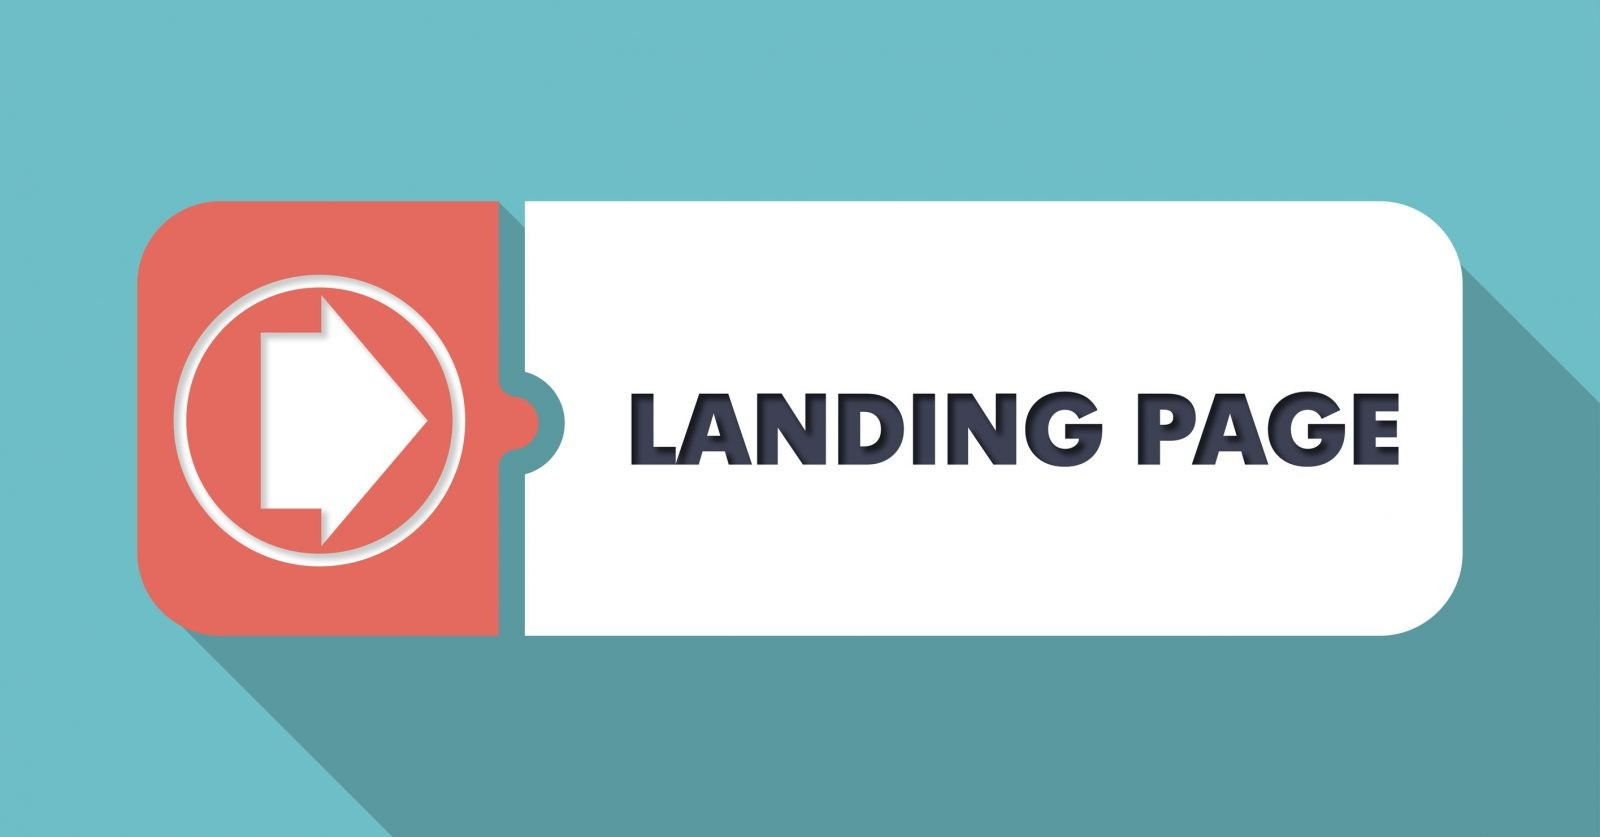 ЗАКАЗЫВАТЬ LANDING PAGE 2.0